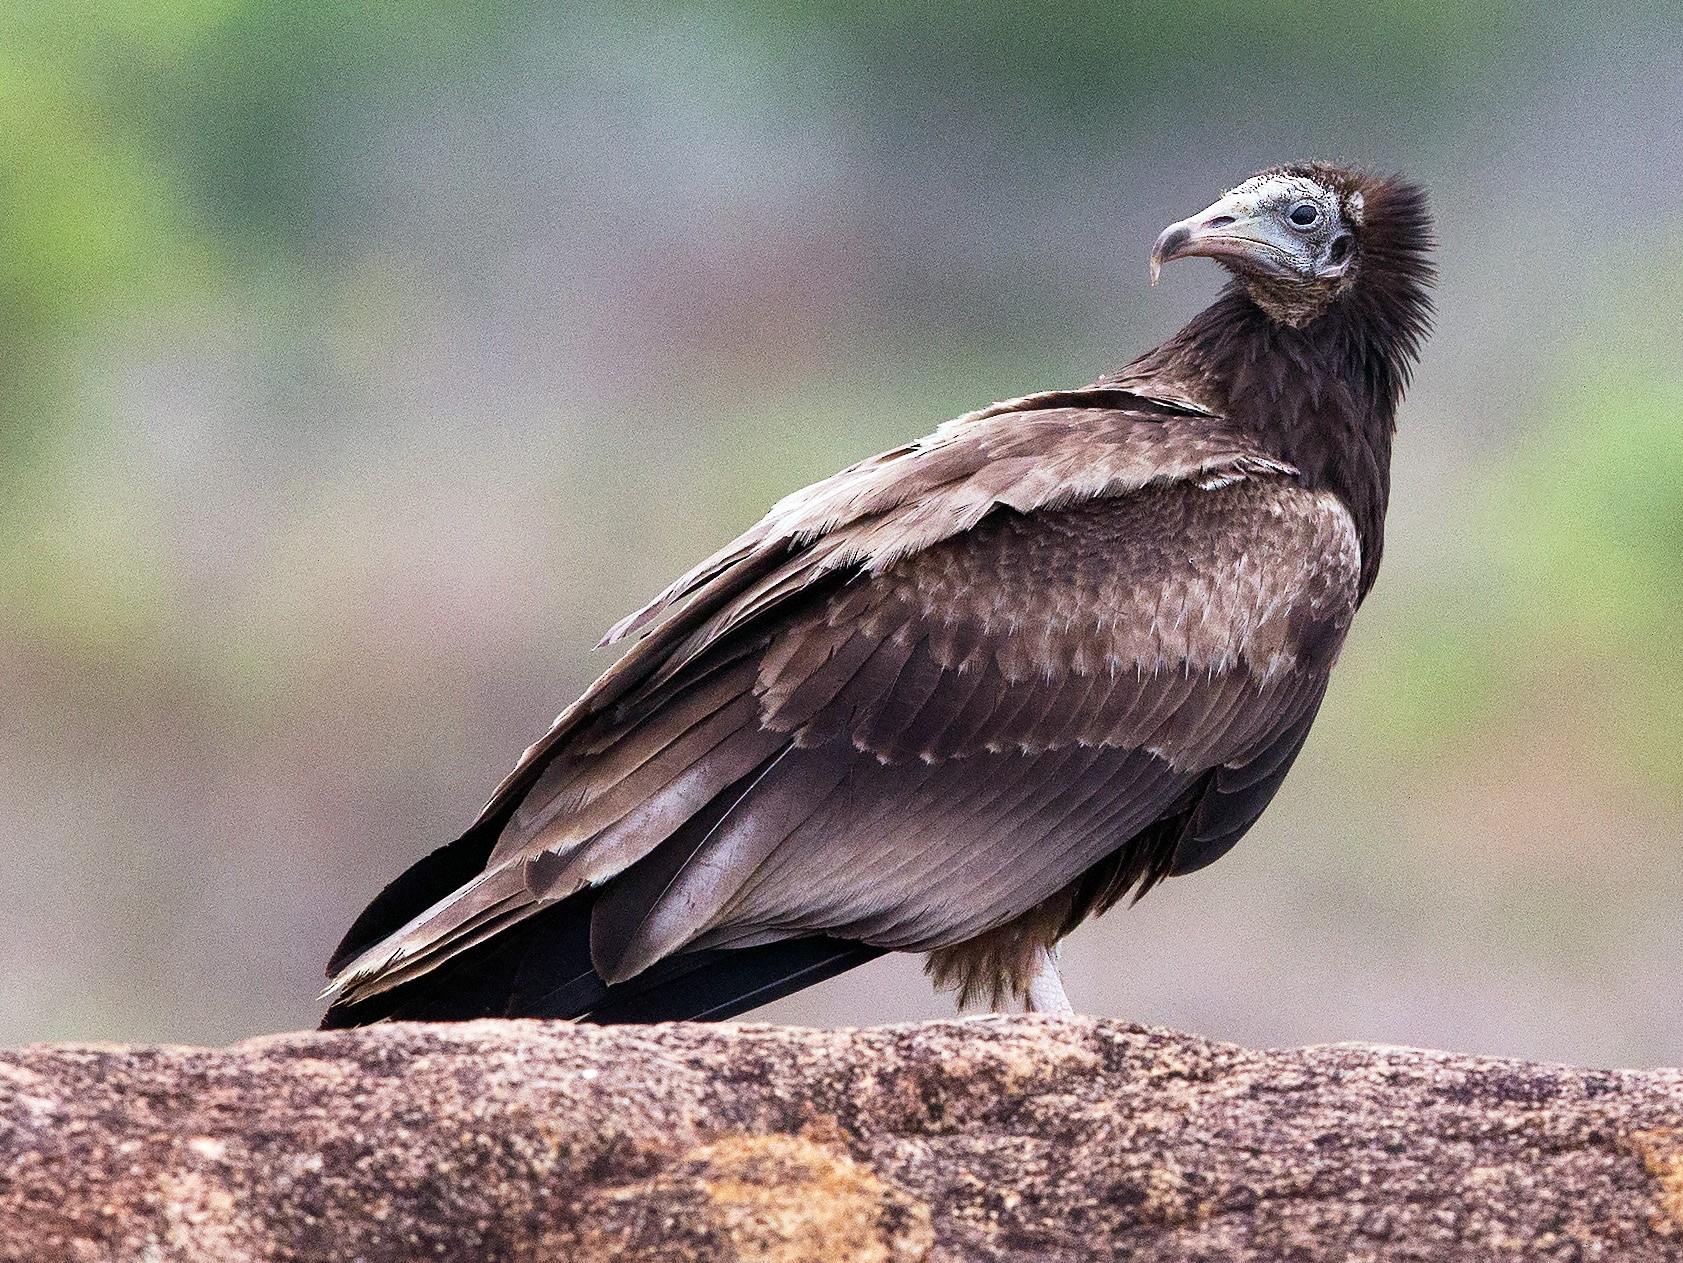 Egyptian Vulture - Subbu Rajan